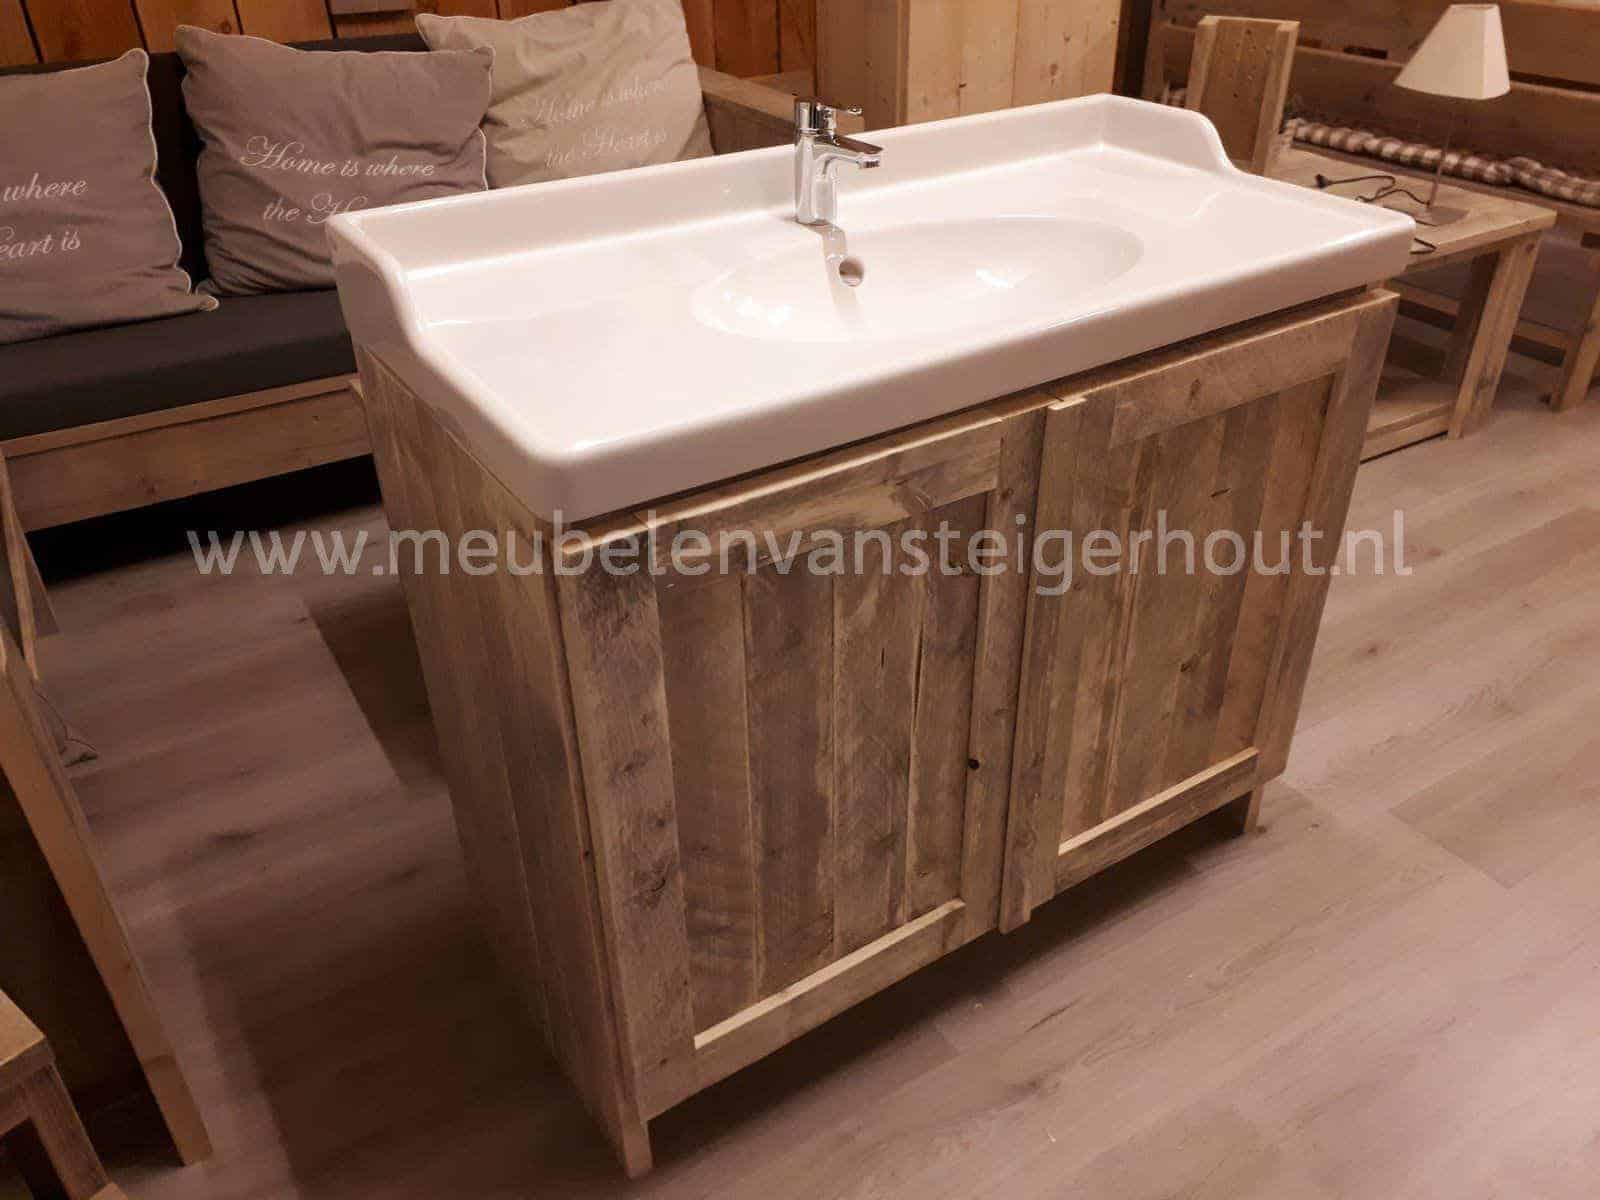 Badkamermeubel Van Steigerhout : Badmeubel steigerhout meubelen van steigerhout